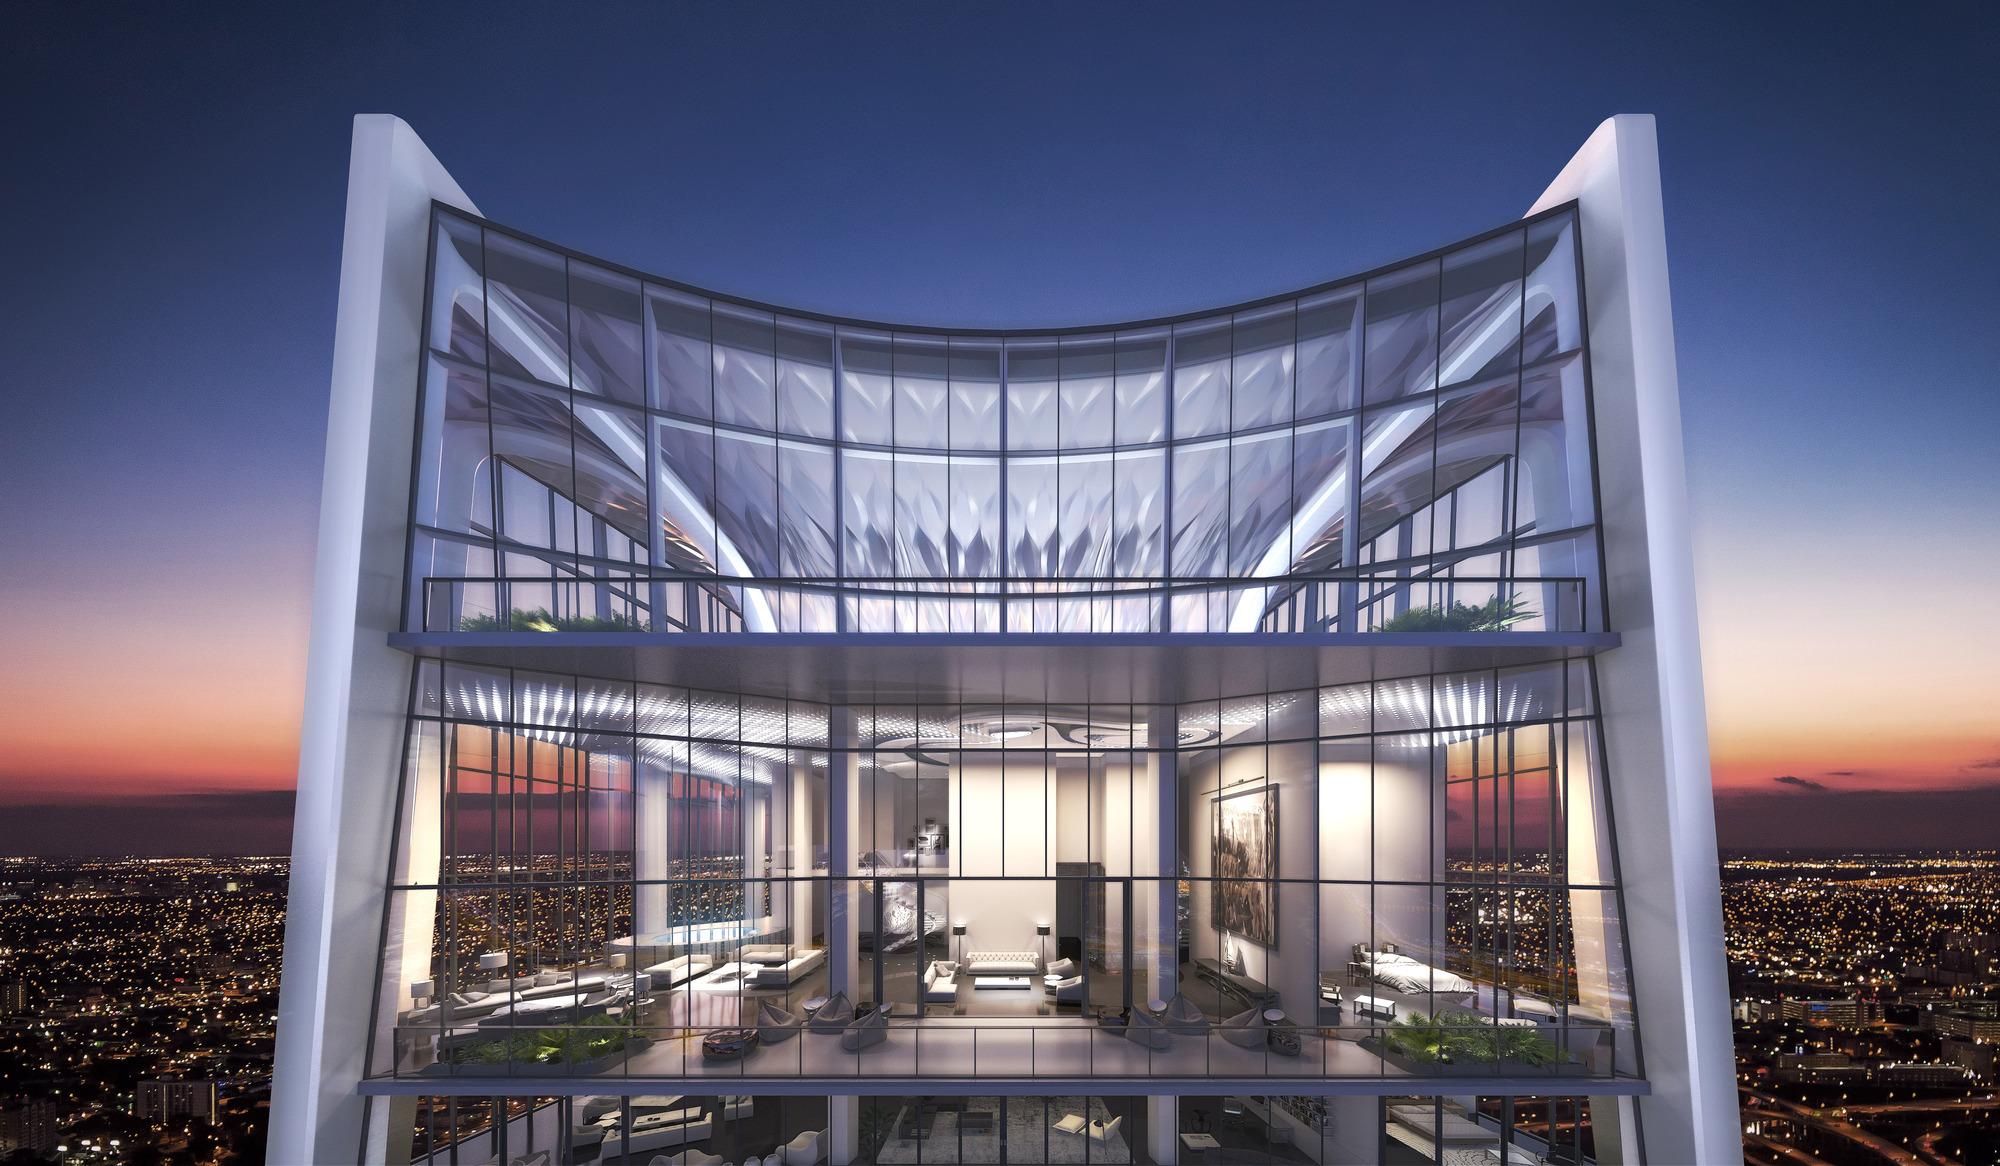 Glass Apartments Miami For Sale